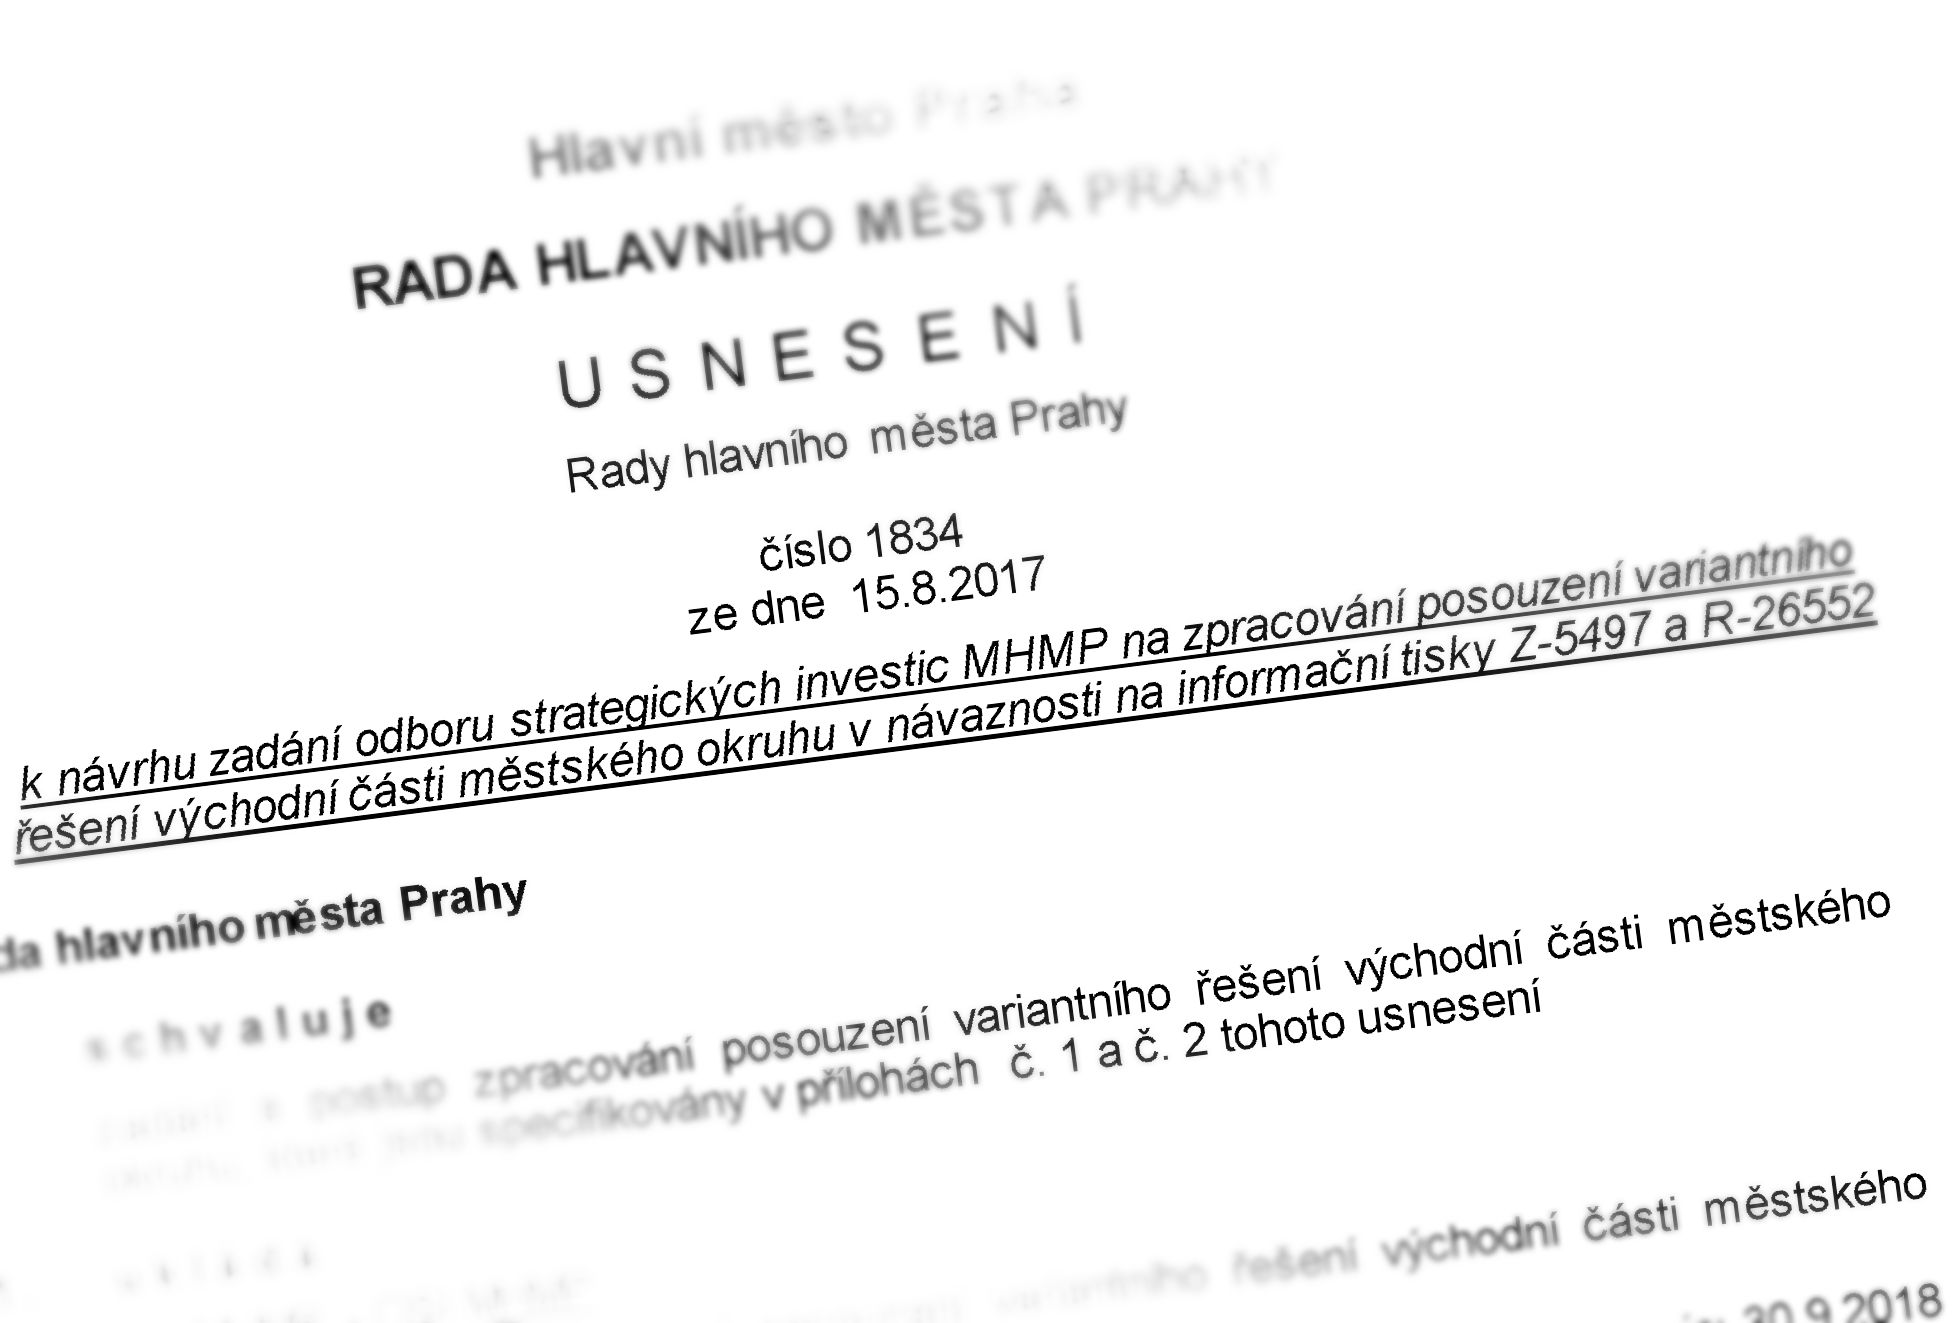 Usnesení RHMP